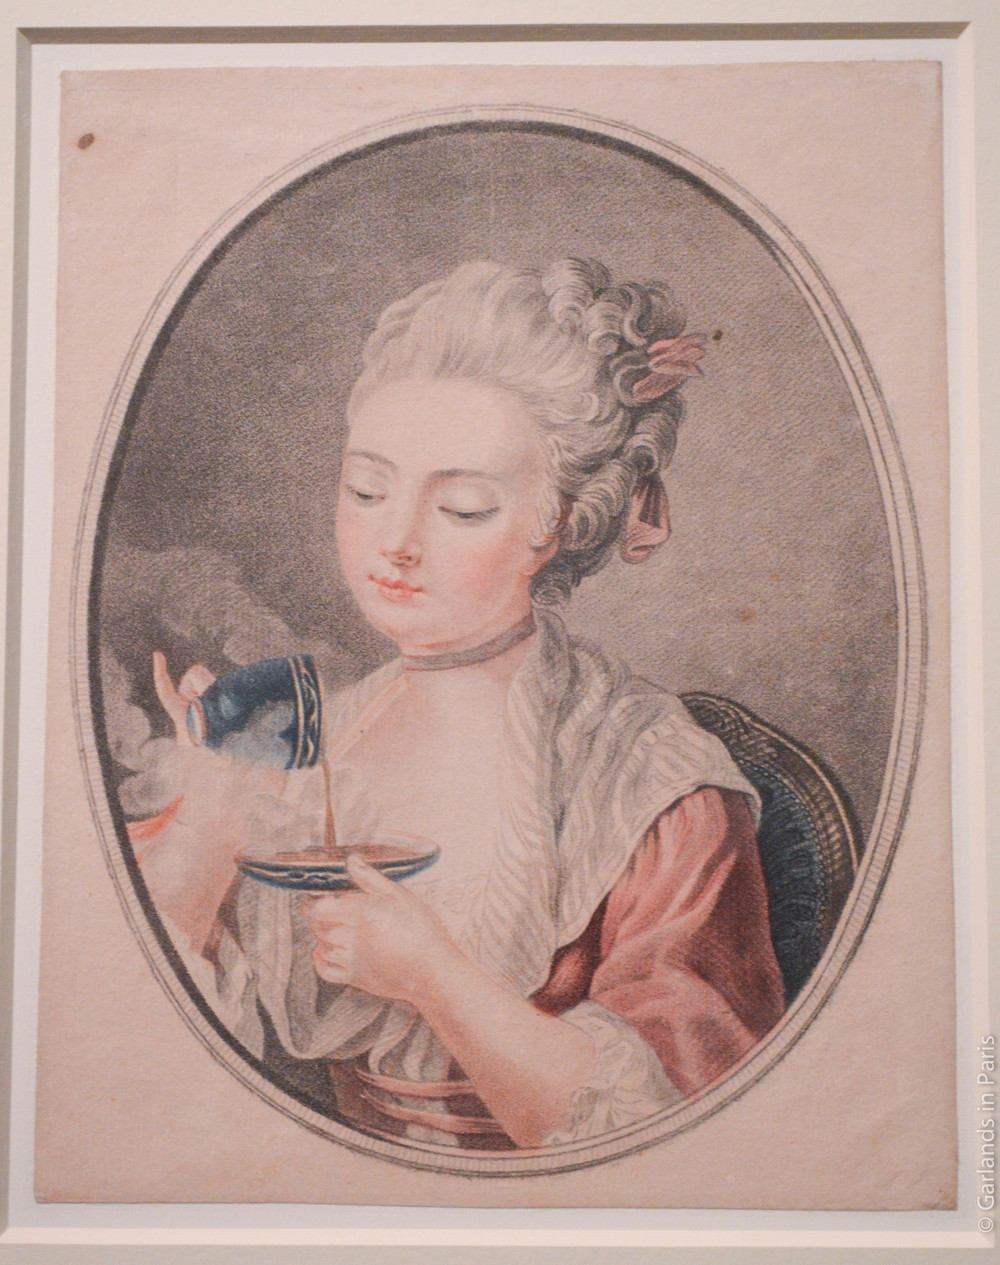 Girl sipping tea